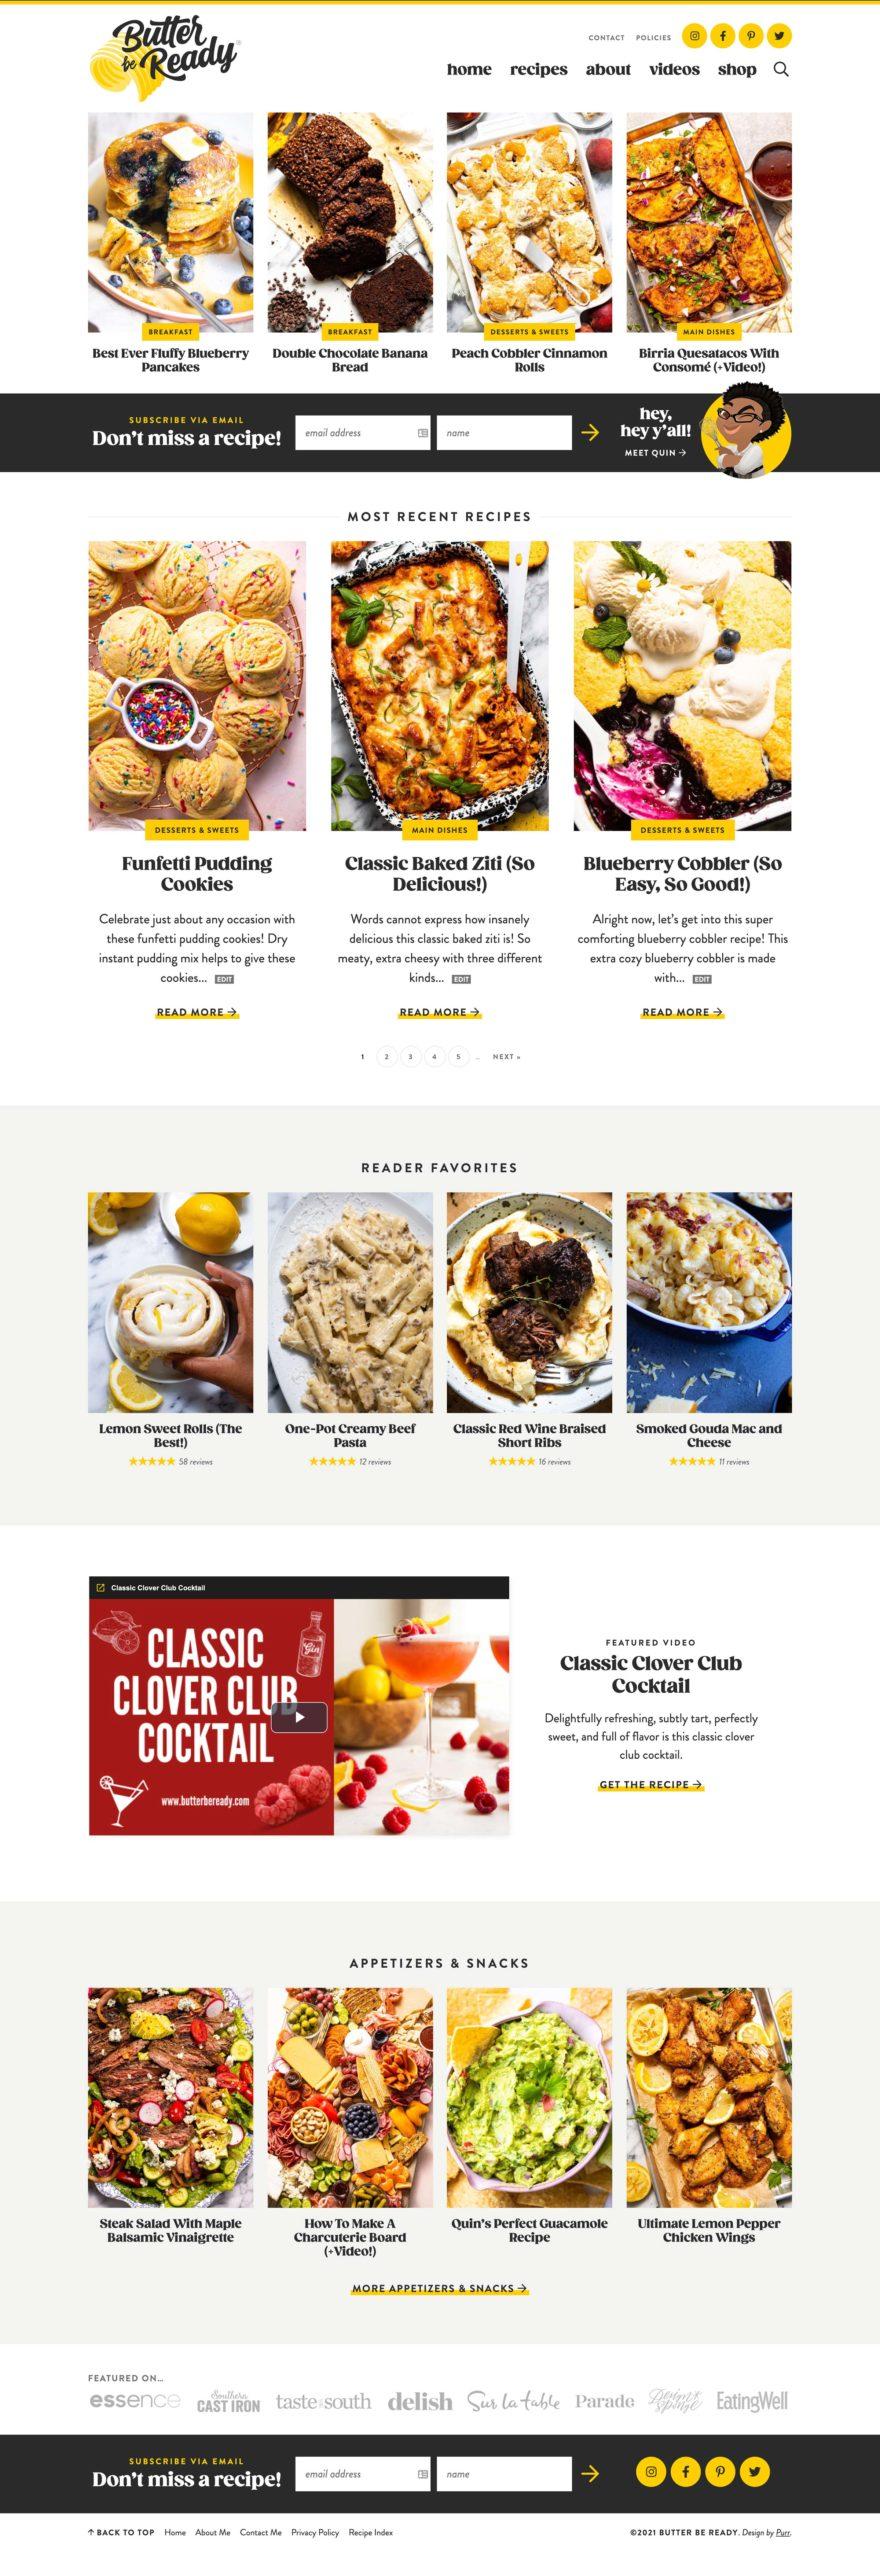 Butter be Ready homepage screenshot